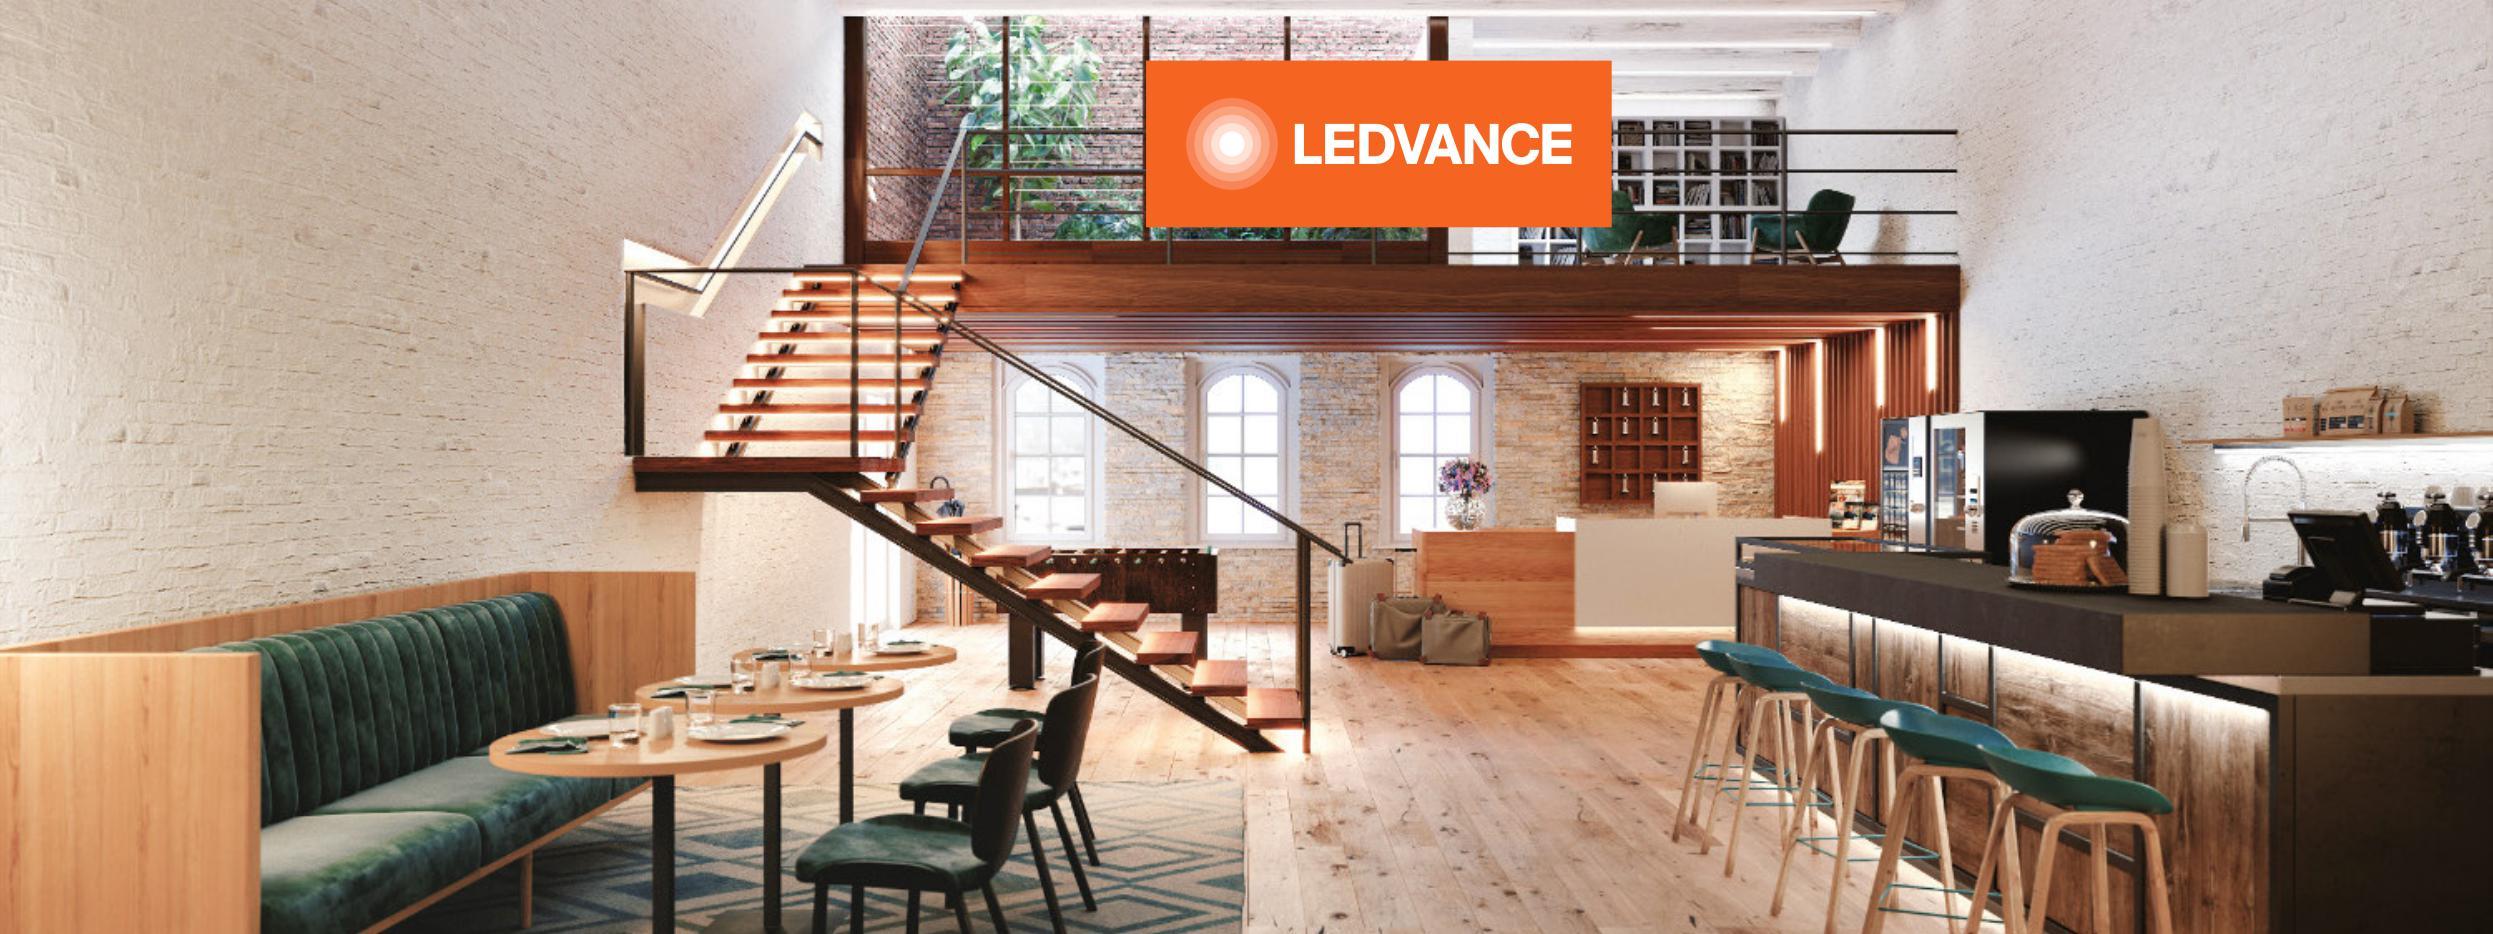 Presentation marque Ledvance